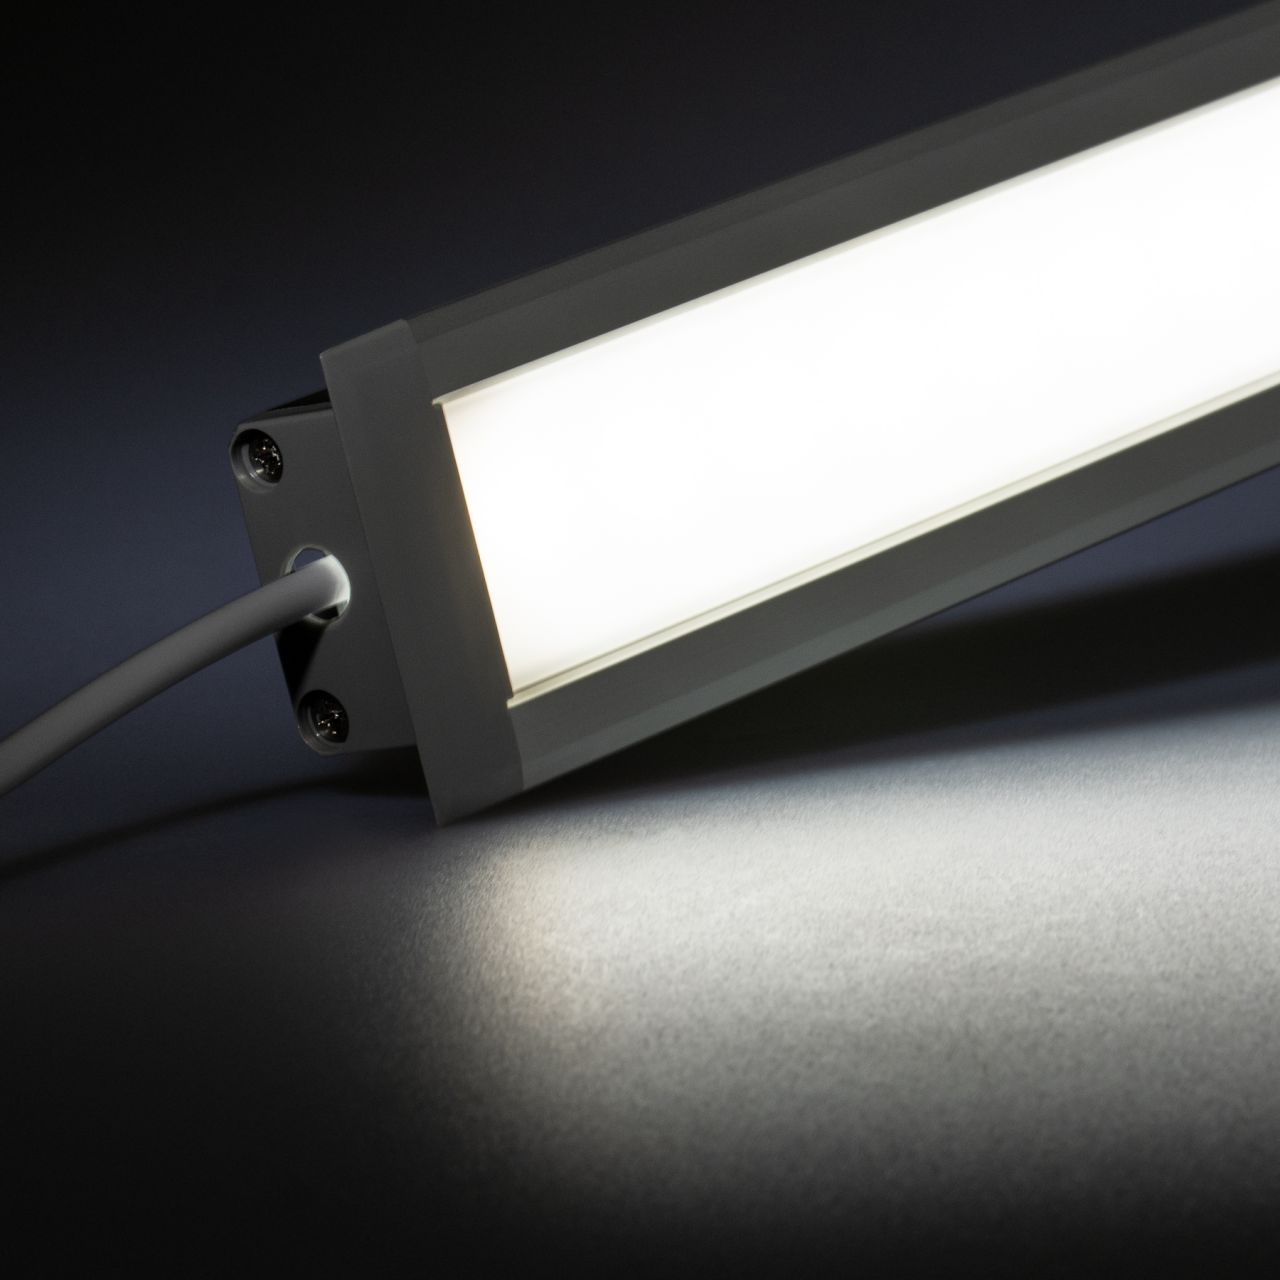 12V Aluminium Einbau LED Leiste – High Power - weiß – diffuse Abdeckung